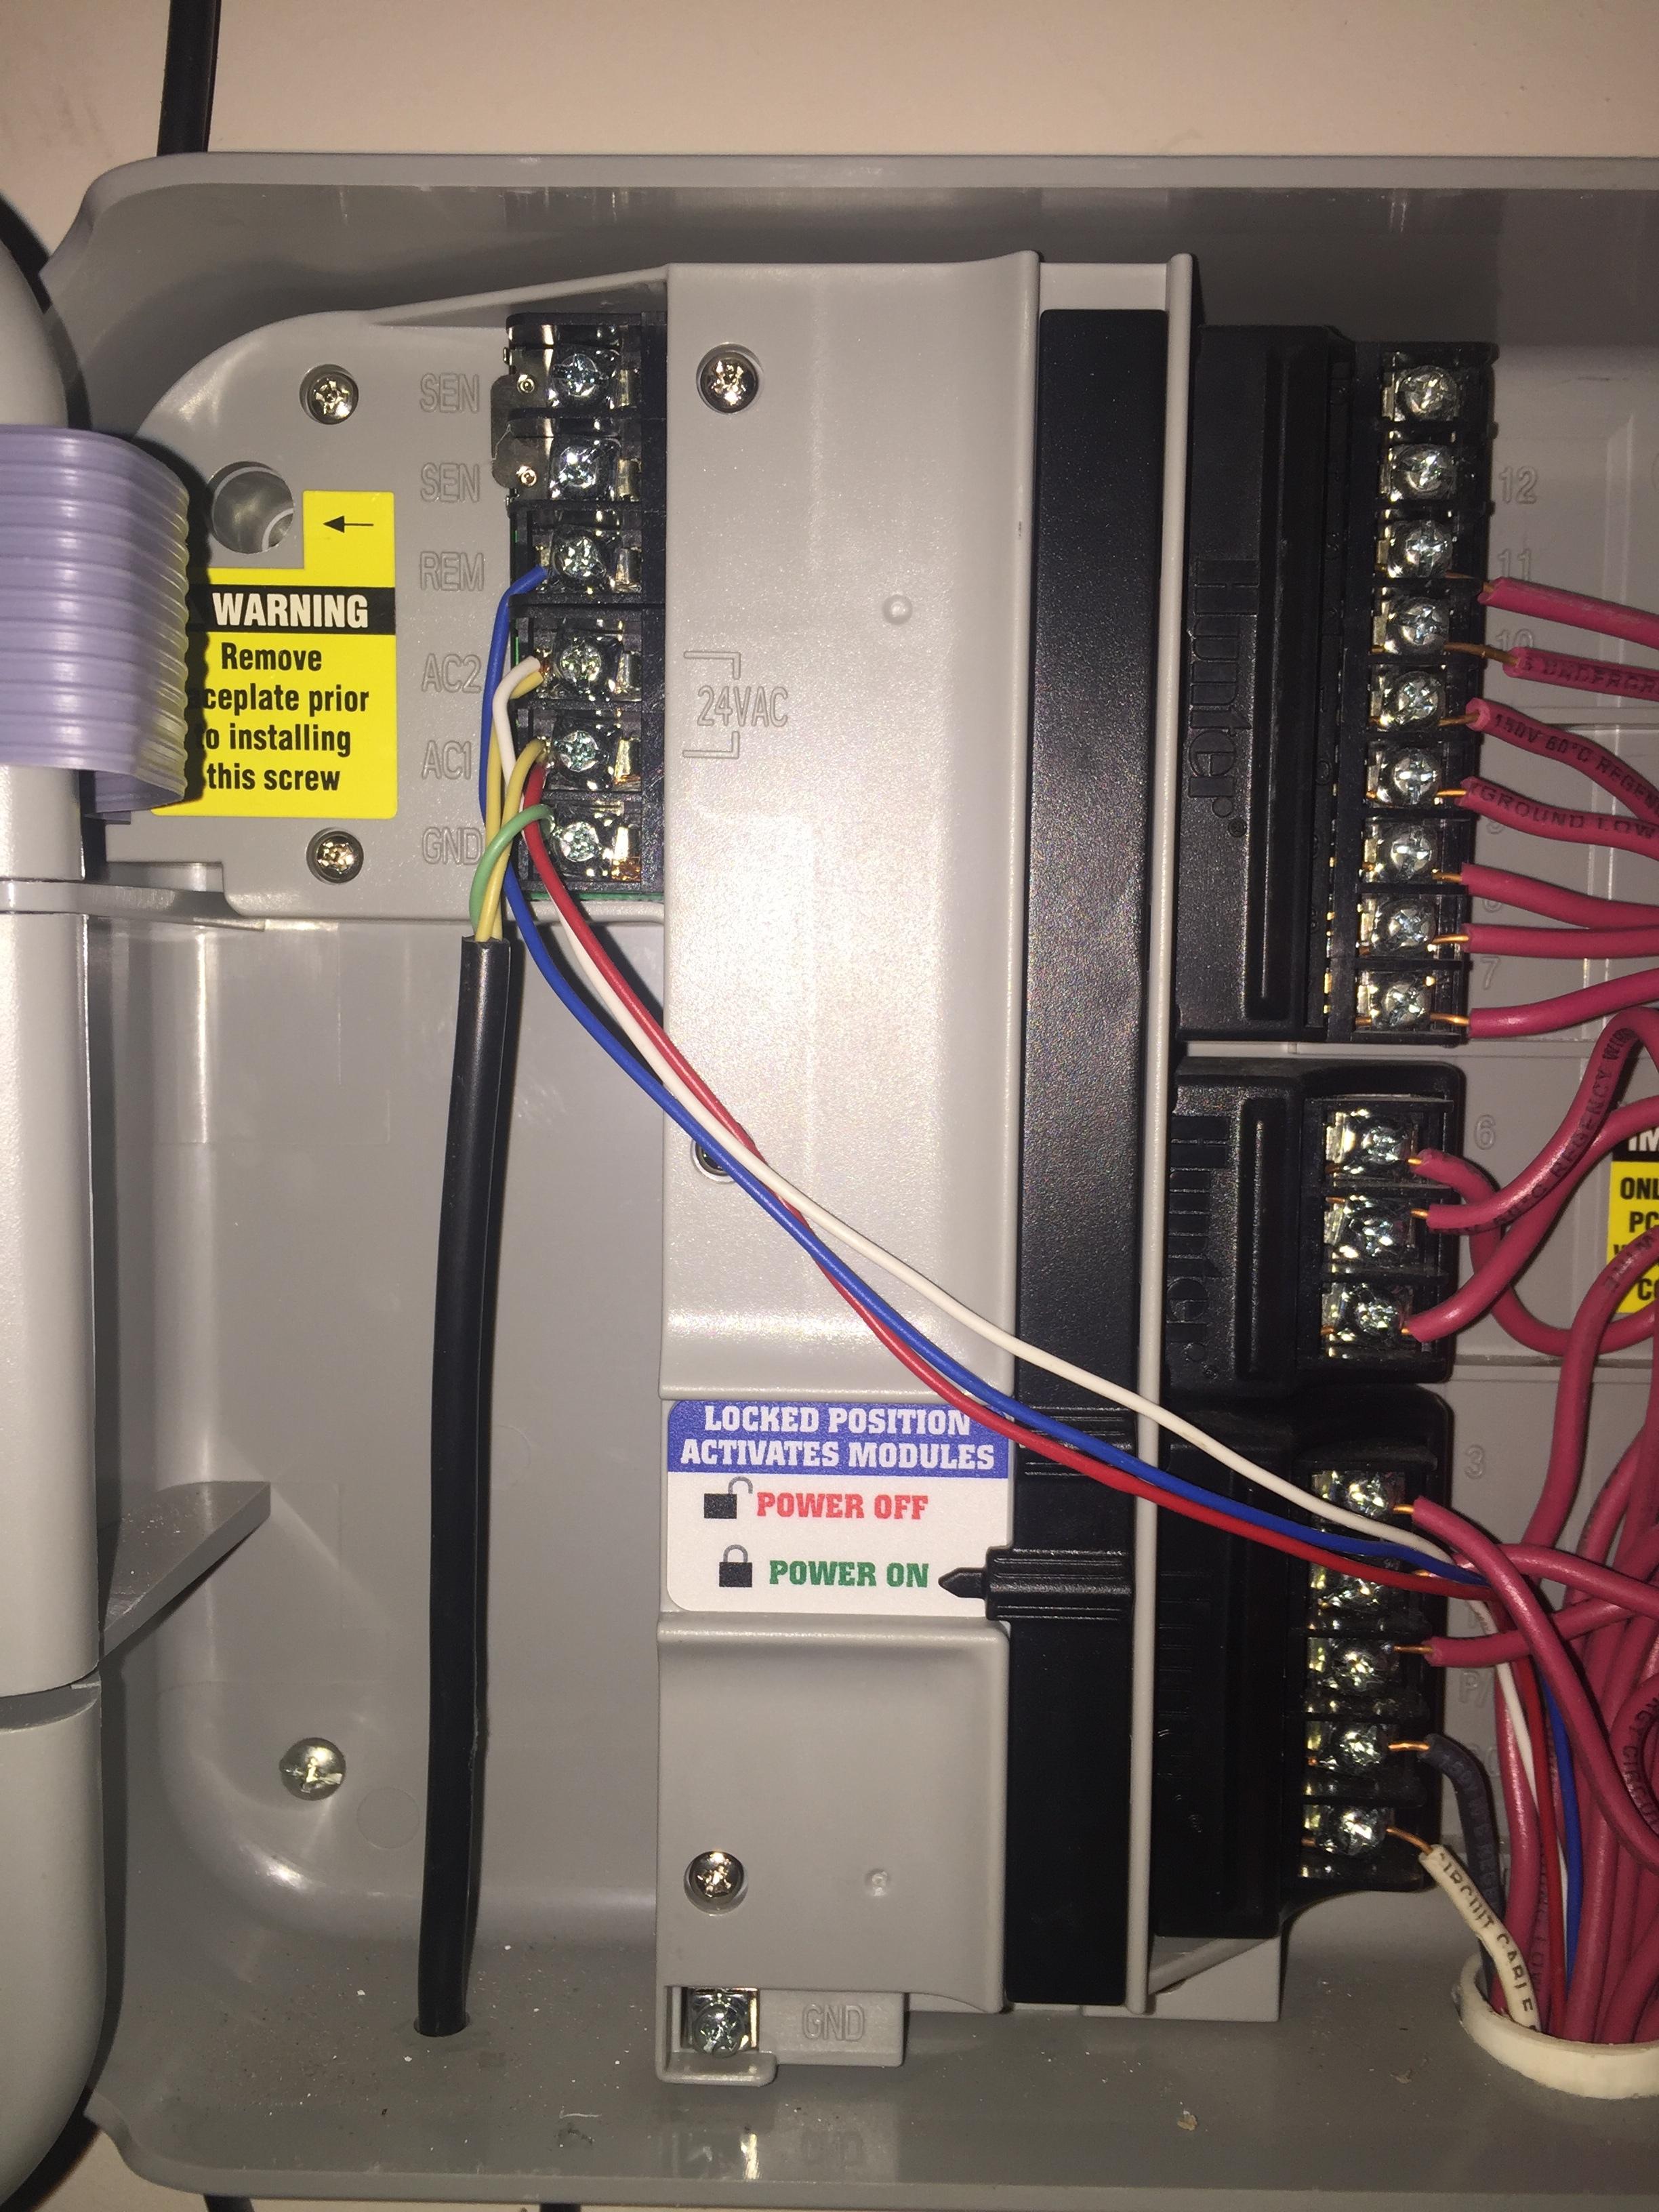 hunter pro c sprinkler system wiring diagram 2002 subaru forester stereo need help installing rachio 2nd gen